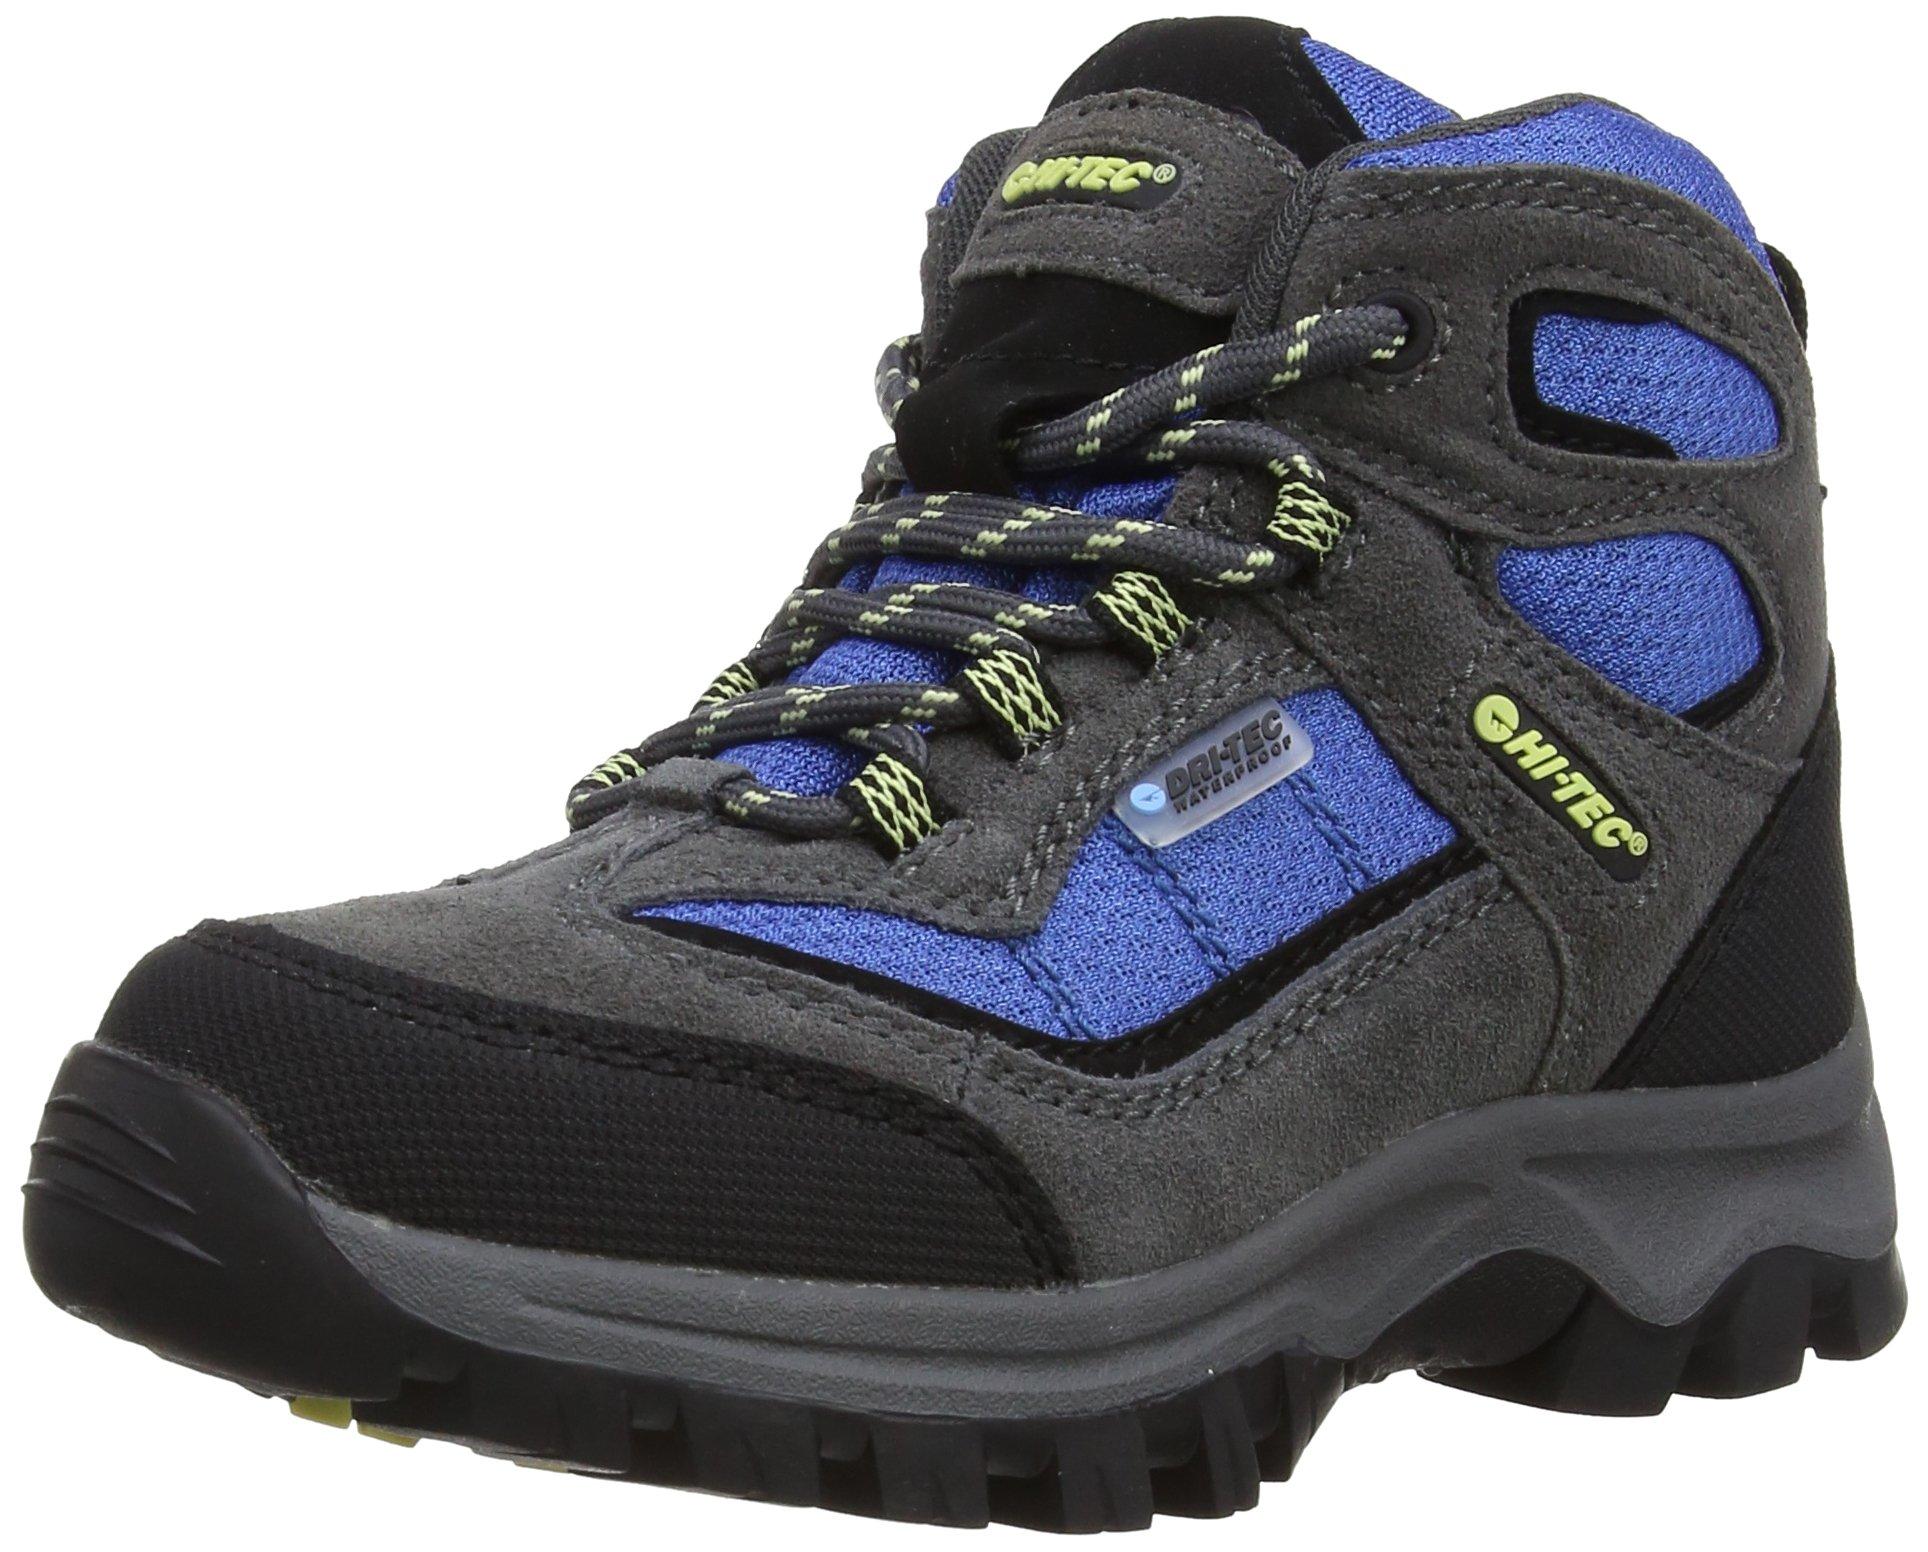 HI TEC Boys' Hillside Waterproof Boot, Grey, US5